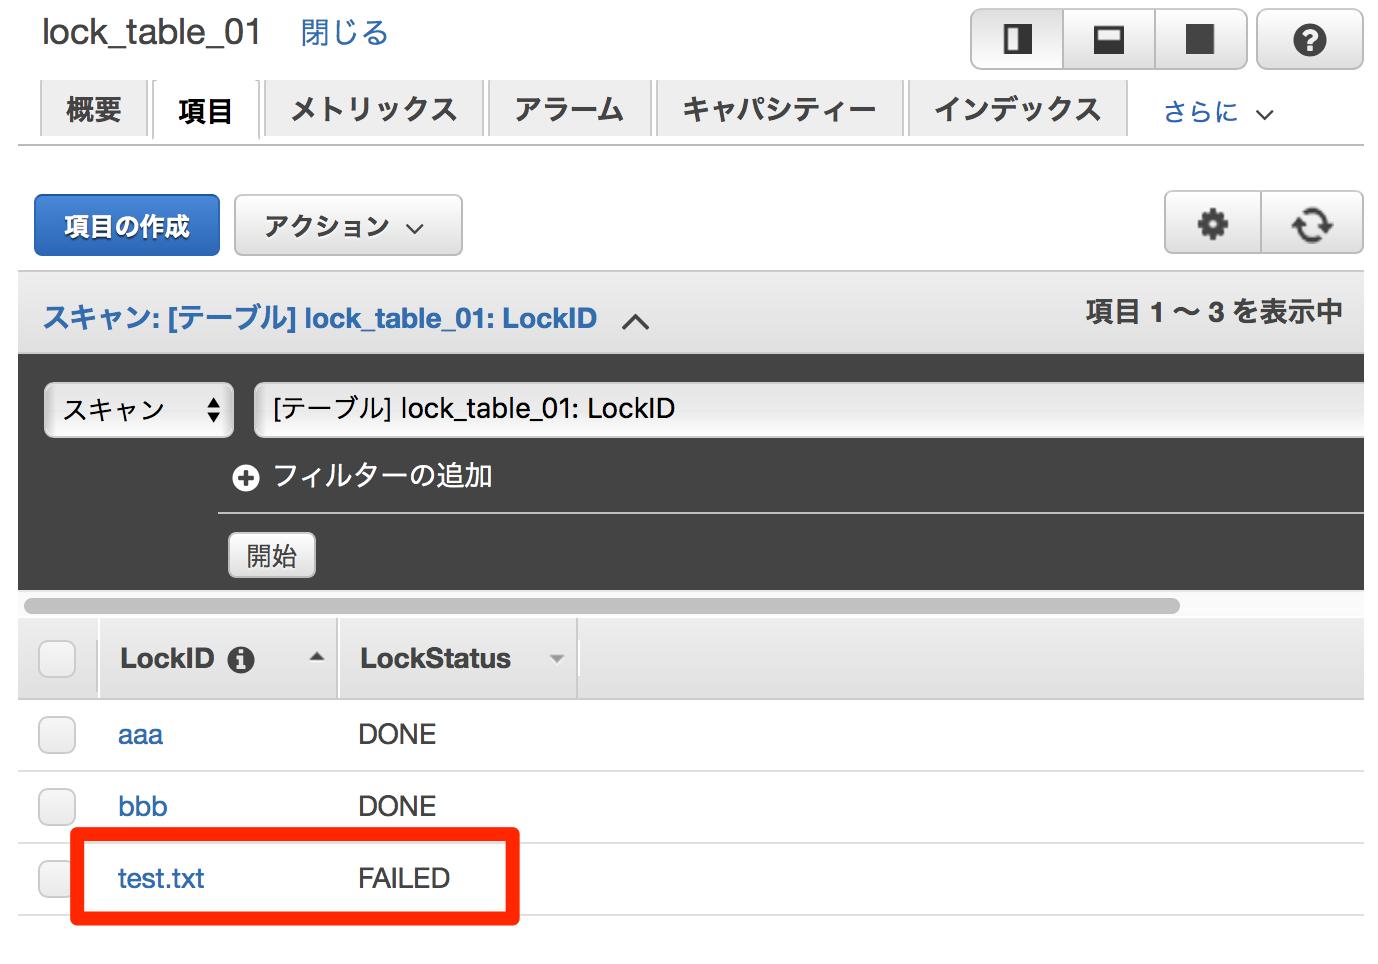 DynamoDBでセマフォを実現するための同時アクセスを検証してみた